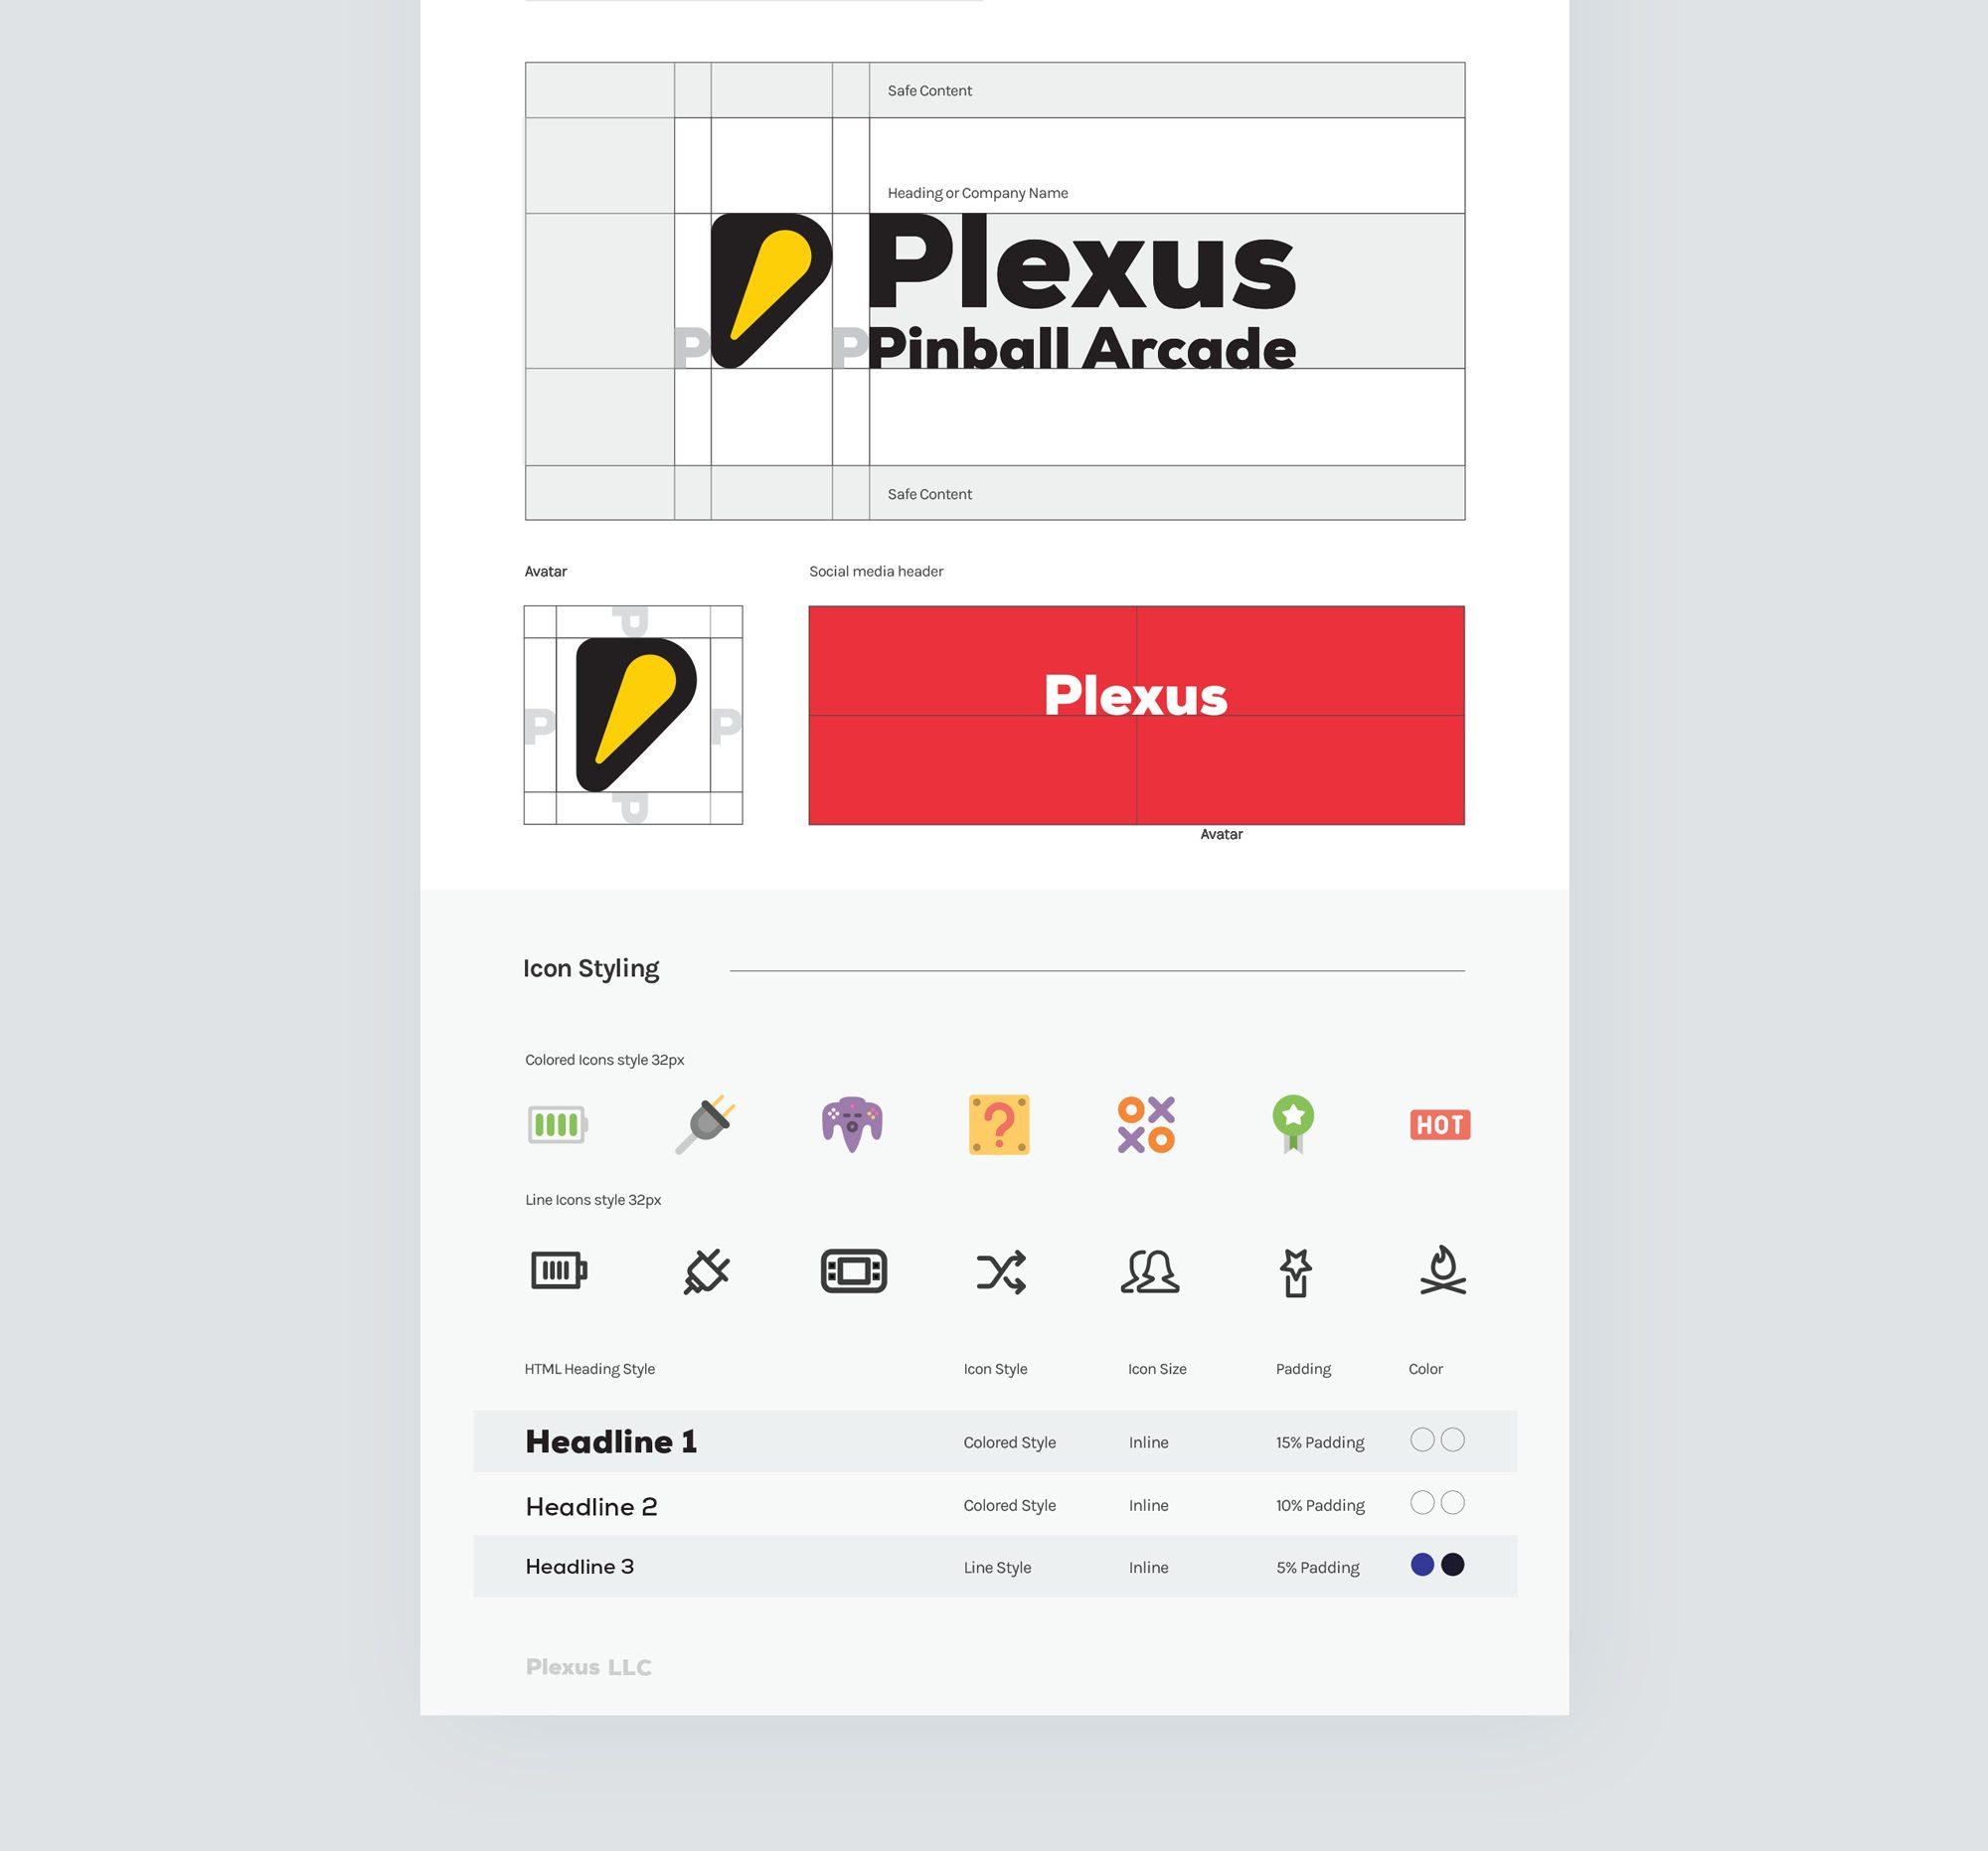 Plexus Arcade Styleguide example presentation